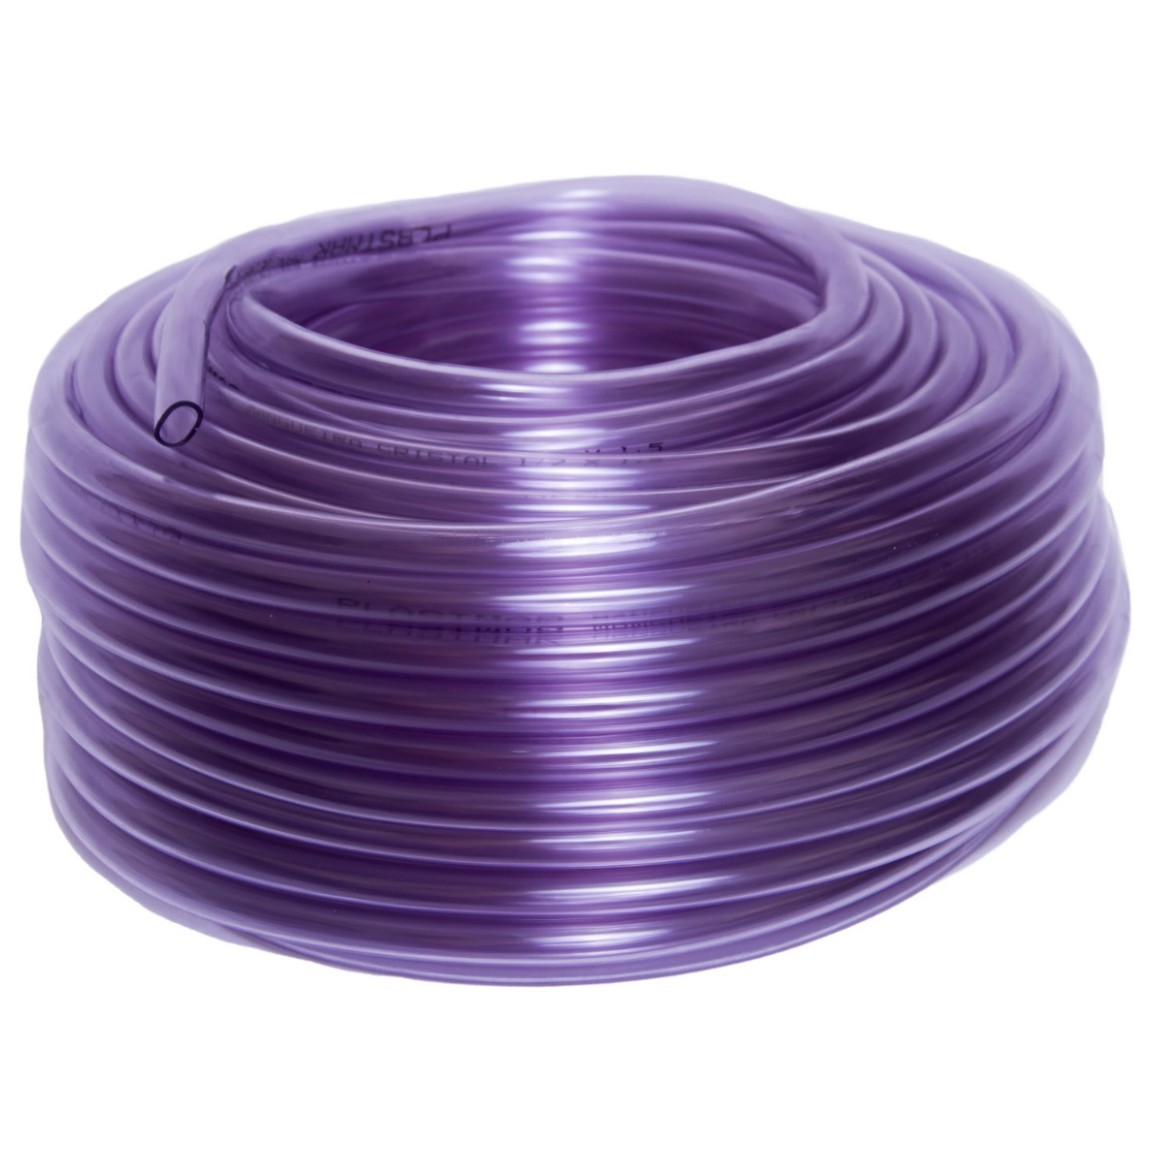 Mangueira de PVC 30m 12 Roxa 778 - Plastmar